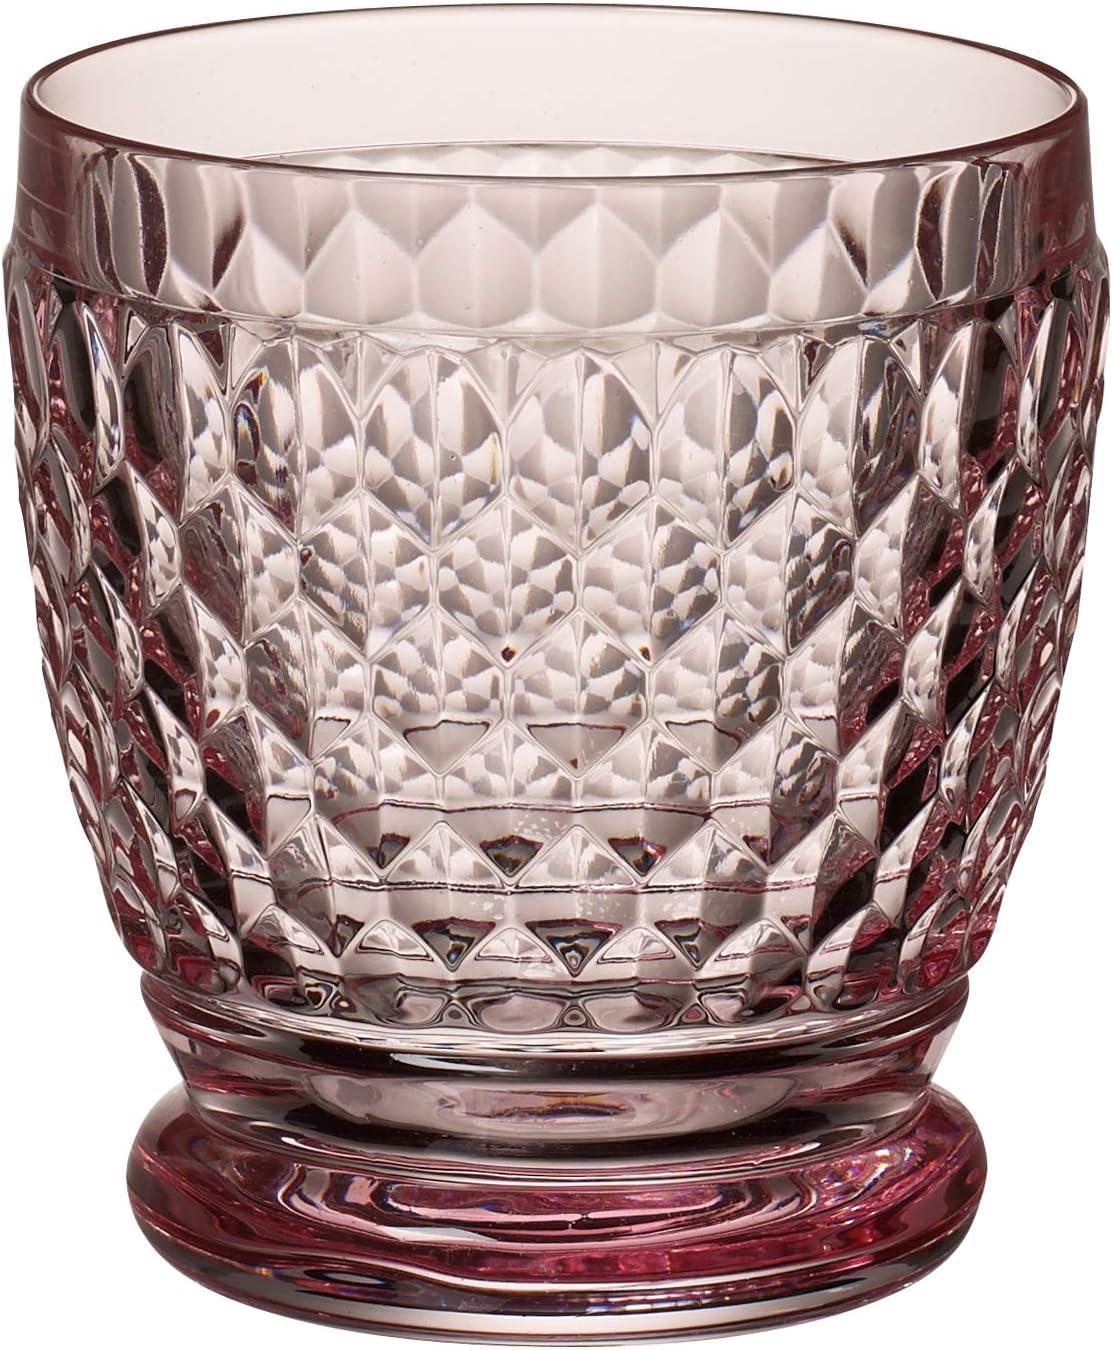 Kristallglas Villeroy /& Boch Boston Coloured Becher Rose 100mm